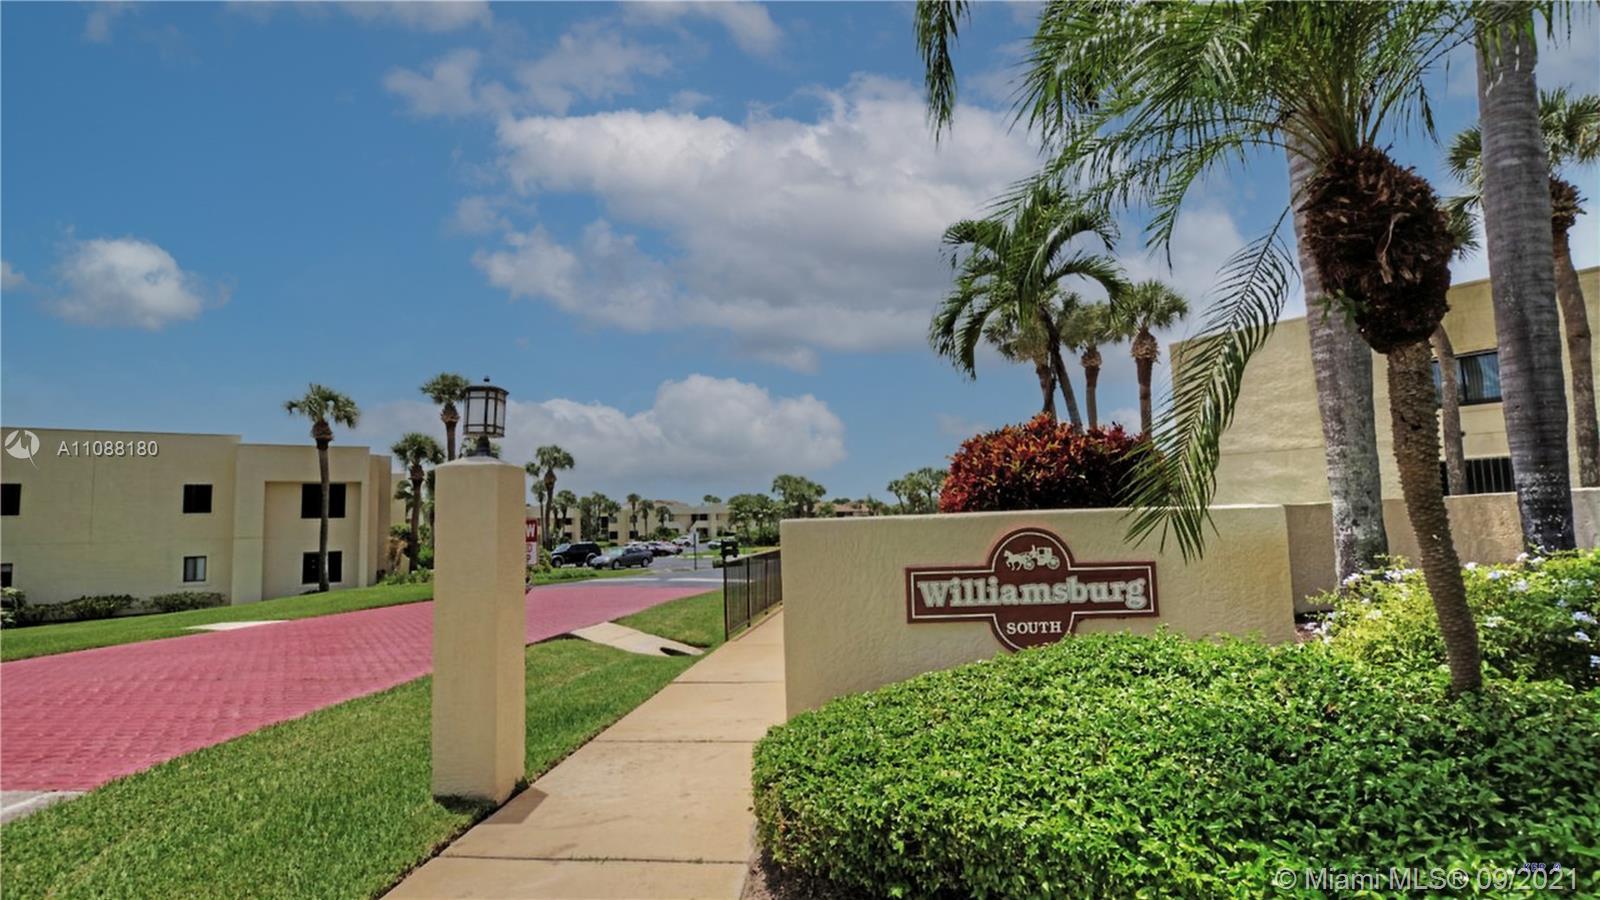 6503 Williamsburg Dr Unit 105, Hobe Sound, Florida 33455